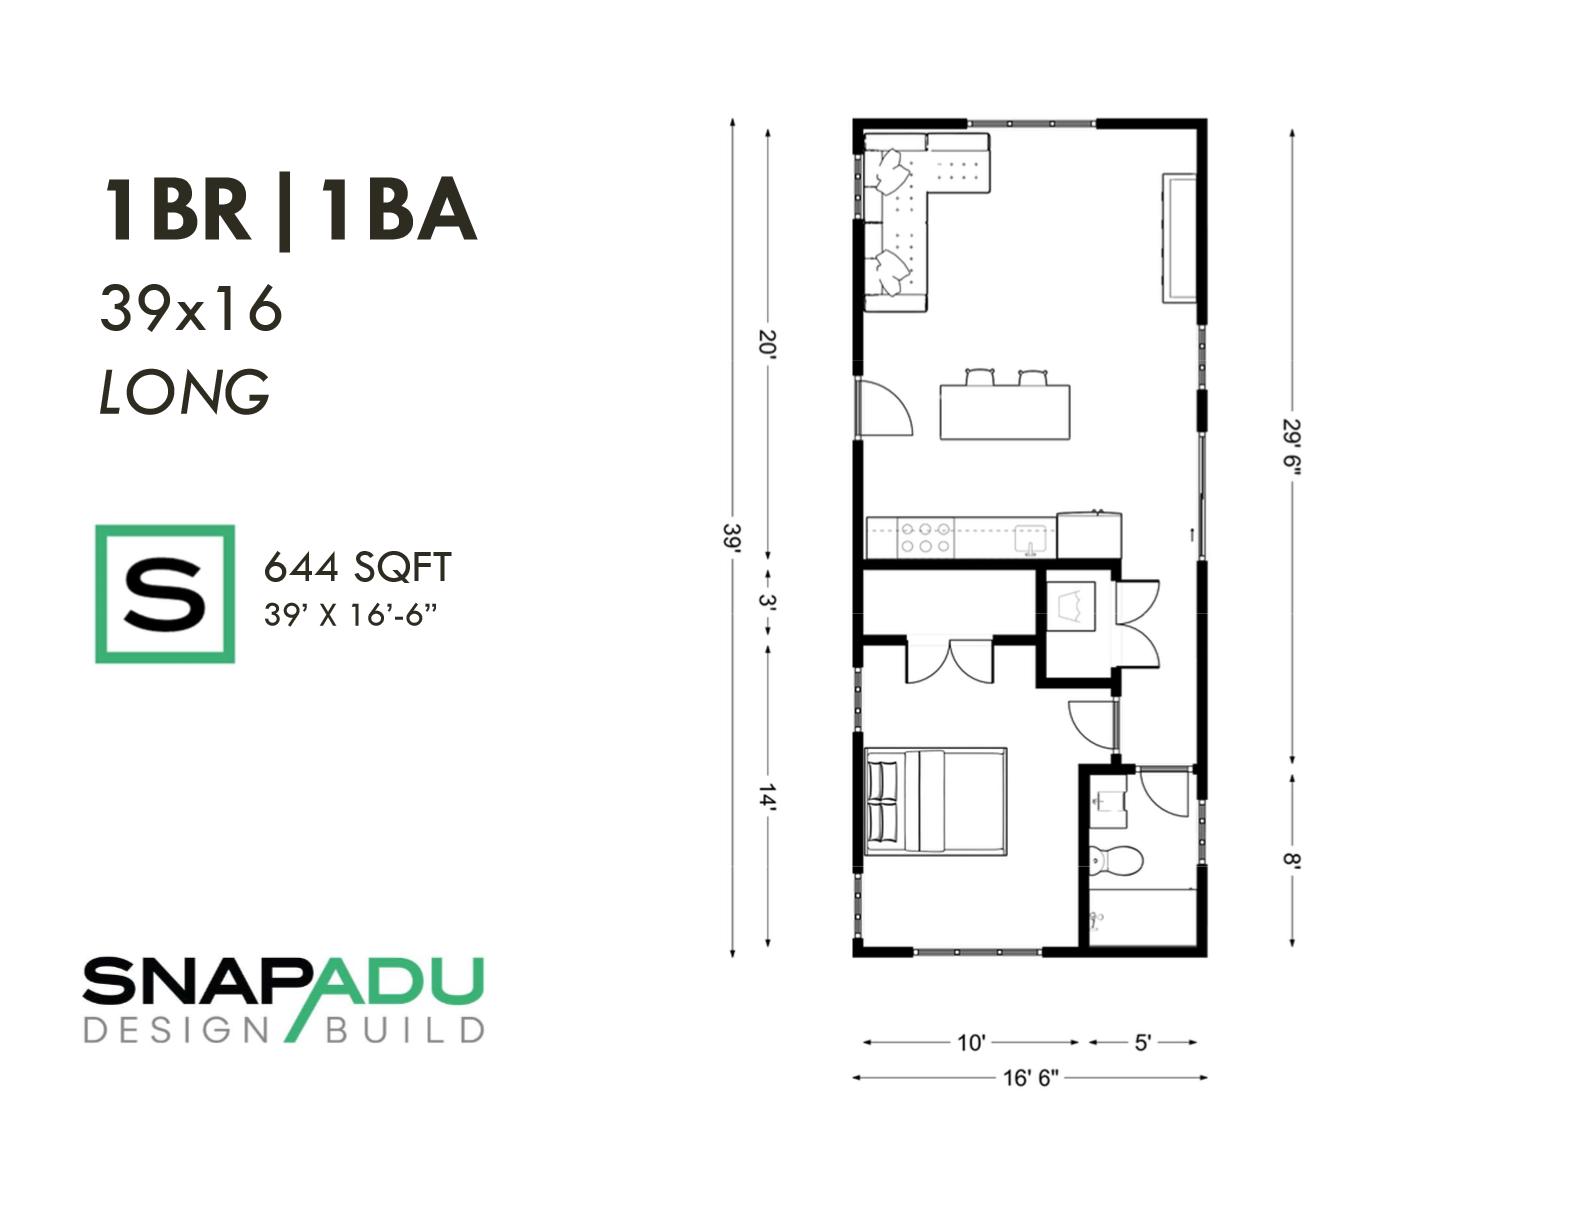 1BR 1BA 650 sqft 39x16 LONG ADU floor plan